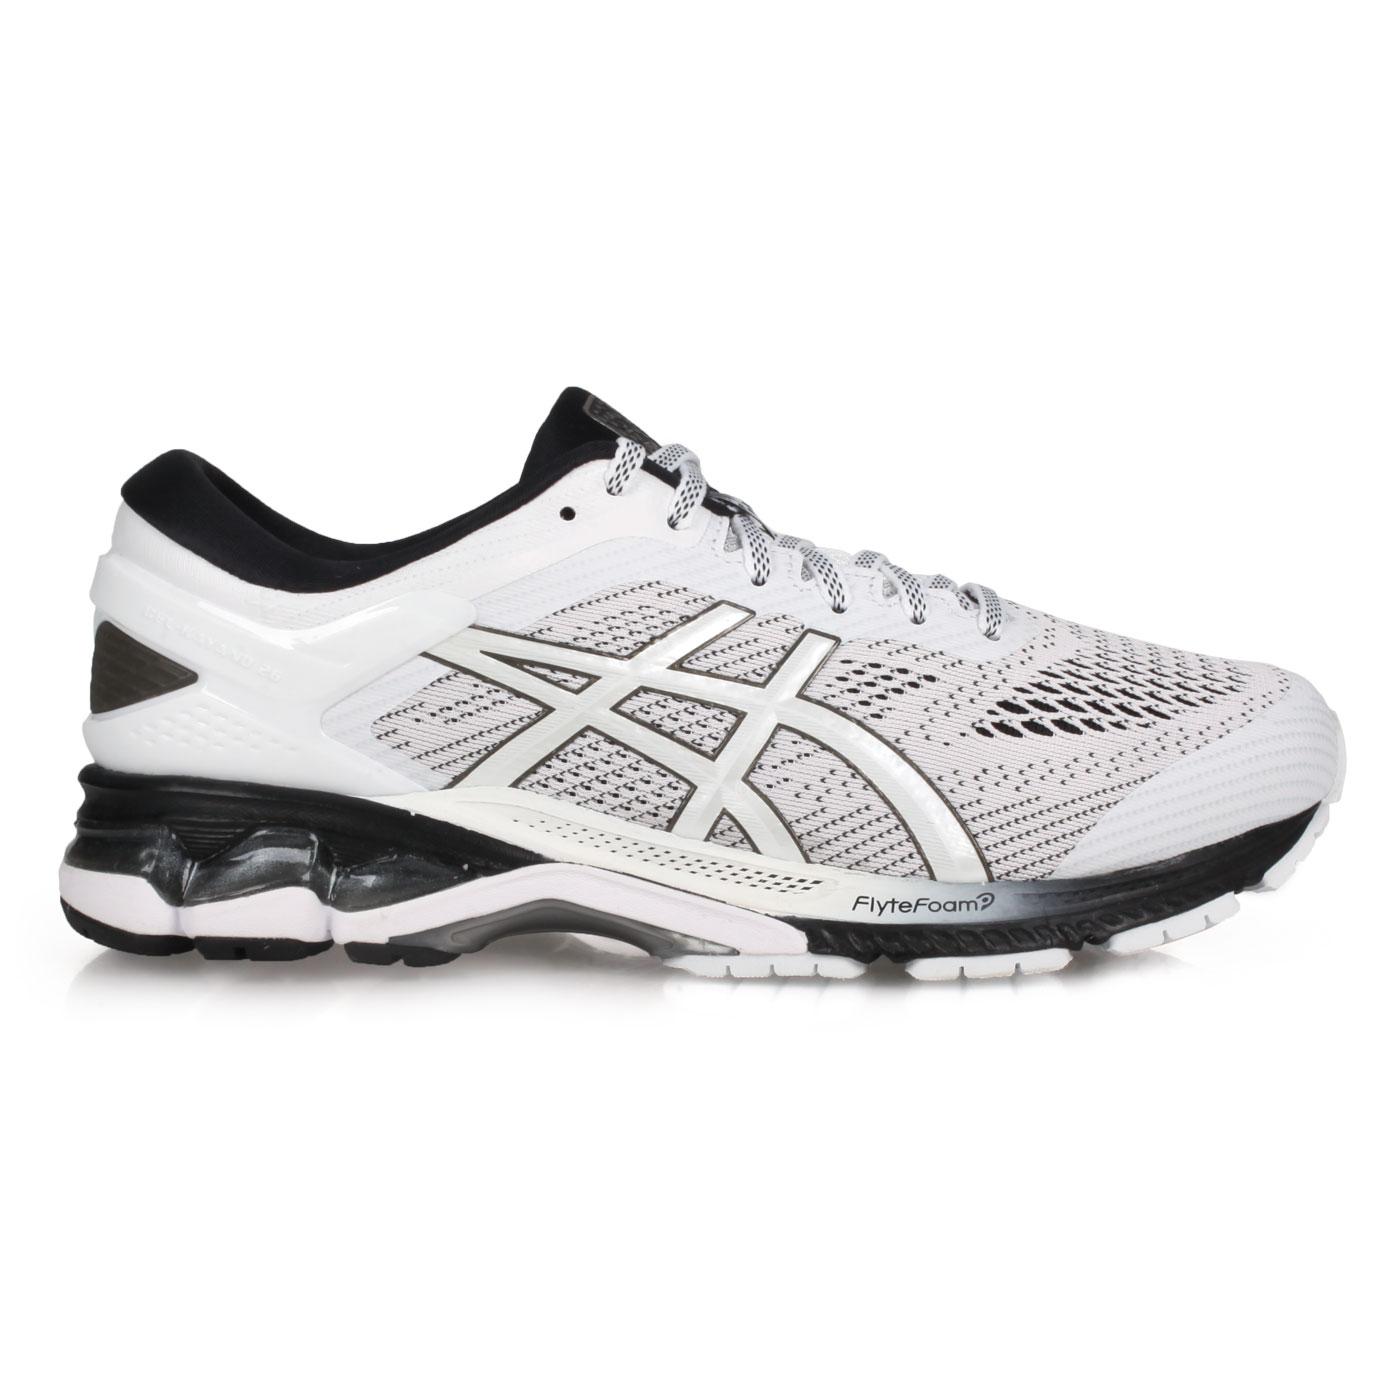 ASICS 男款慢跑鞋  @GEL-KAYANO 26@1011A541-101 - 白淺灰黑